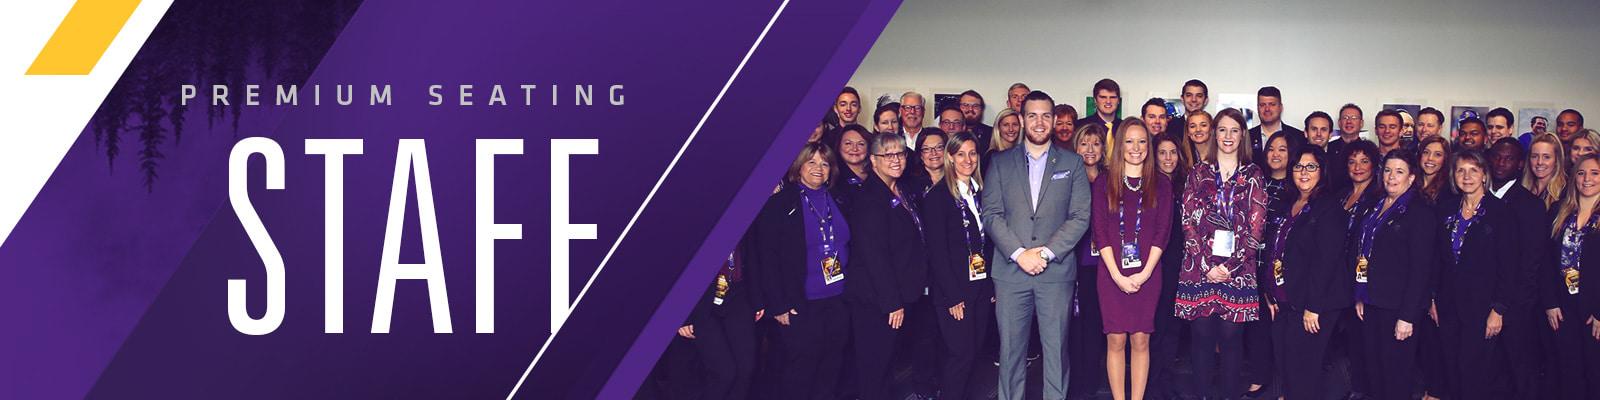 U S  Bank Stadium Premium Seating Staff | Minnesota Vikings